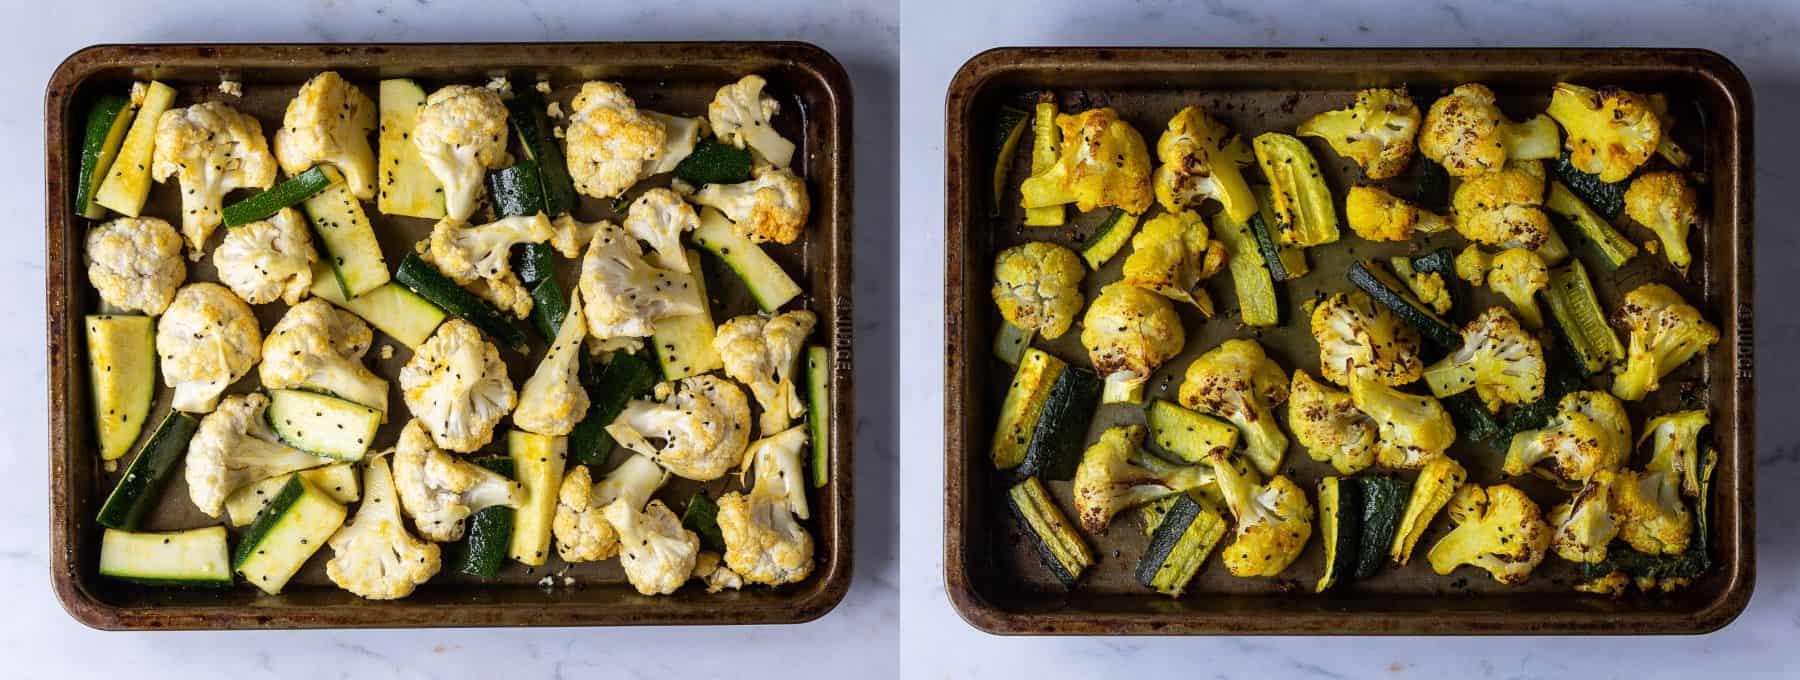 Step 1 - roasting the vegetables.